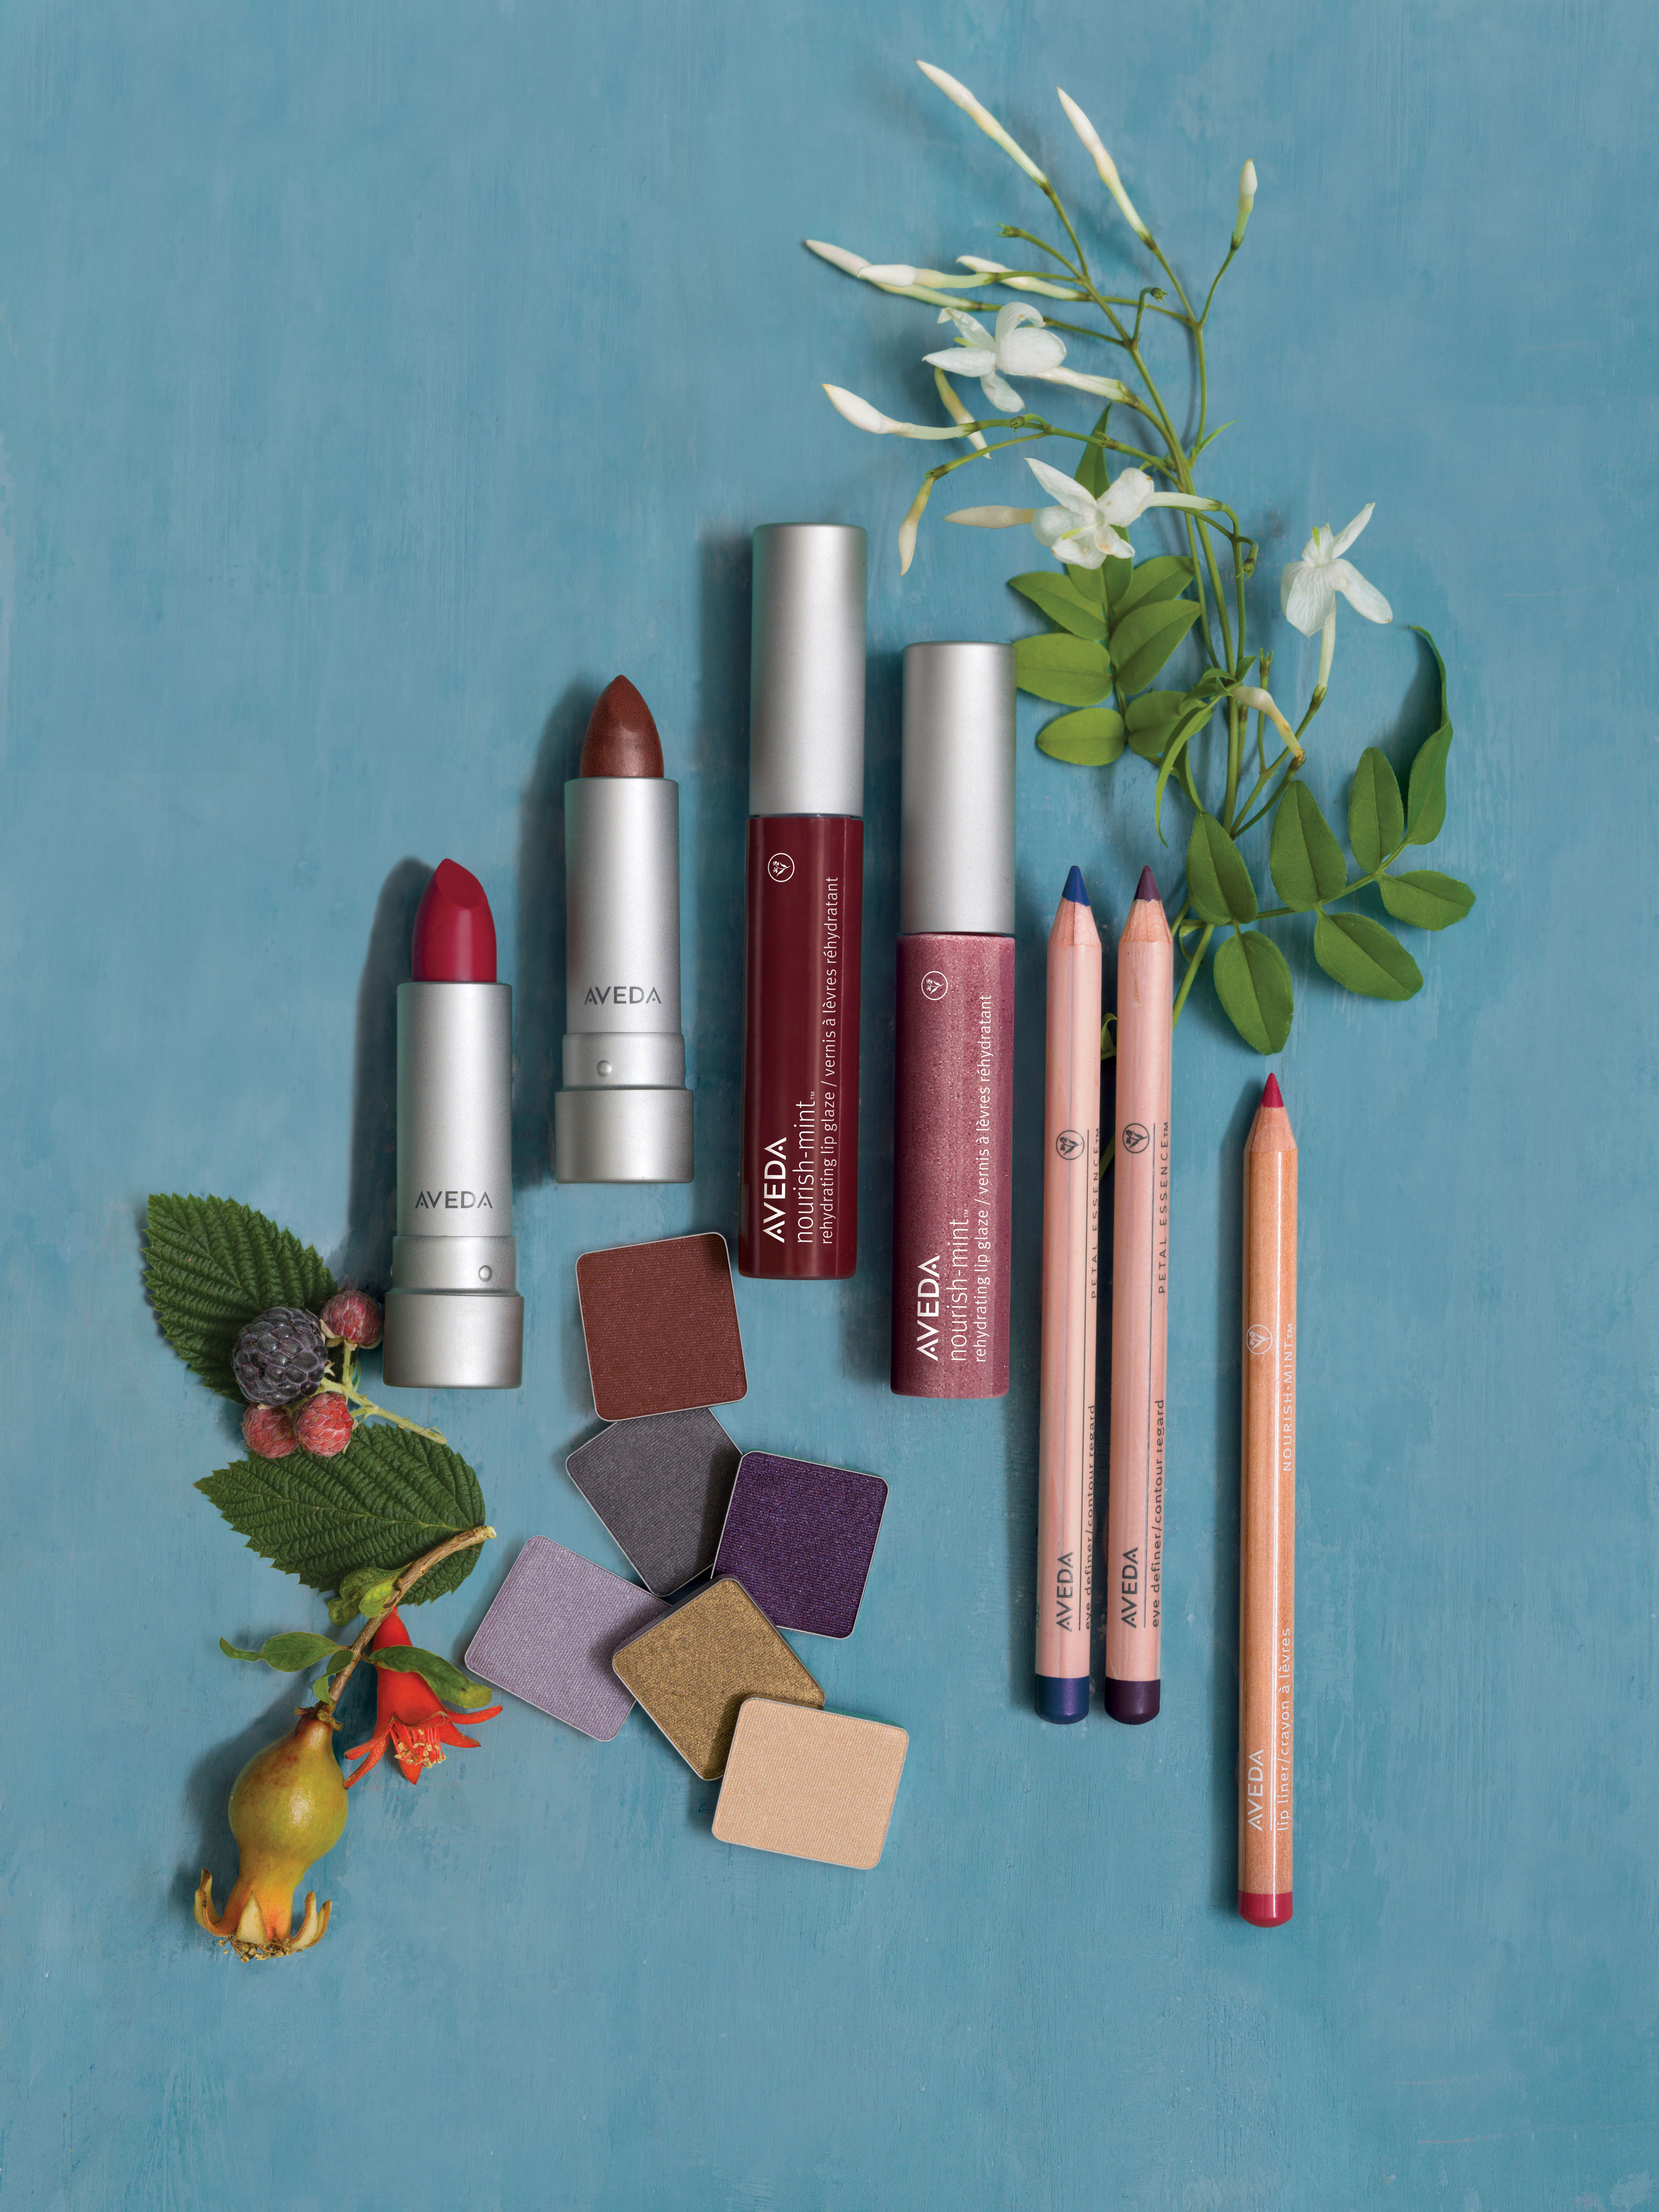 The 2014Romantic Grandeur Collection